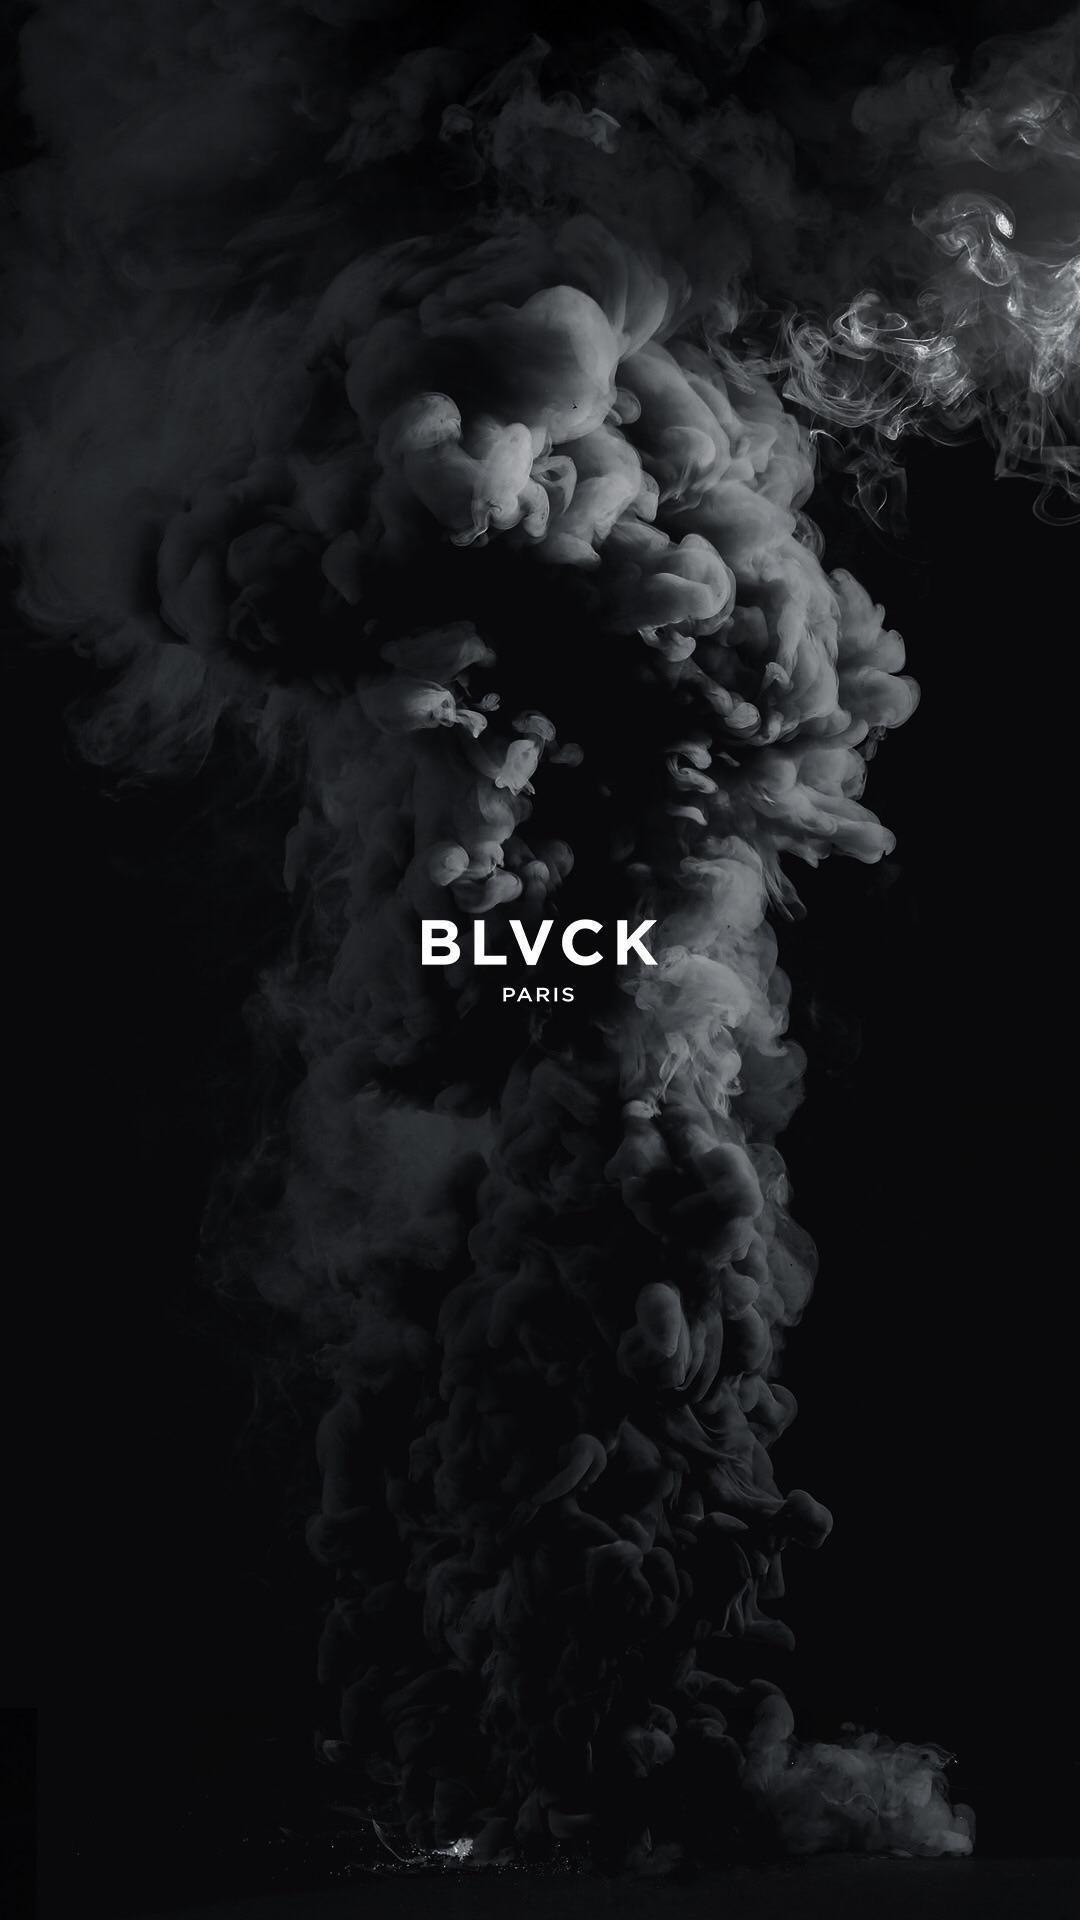 Black Wallpaper Iphone Blackwallpaperiphone Black Wallpaper Iphone Fullhdwallpaperiphone Black Wallpaper Iphone Black Wallpaper Homescreen Wallpaper